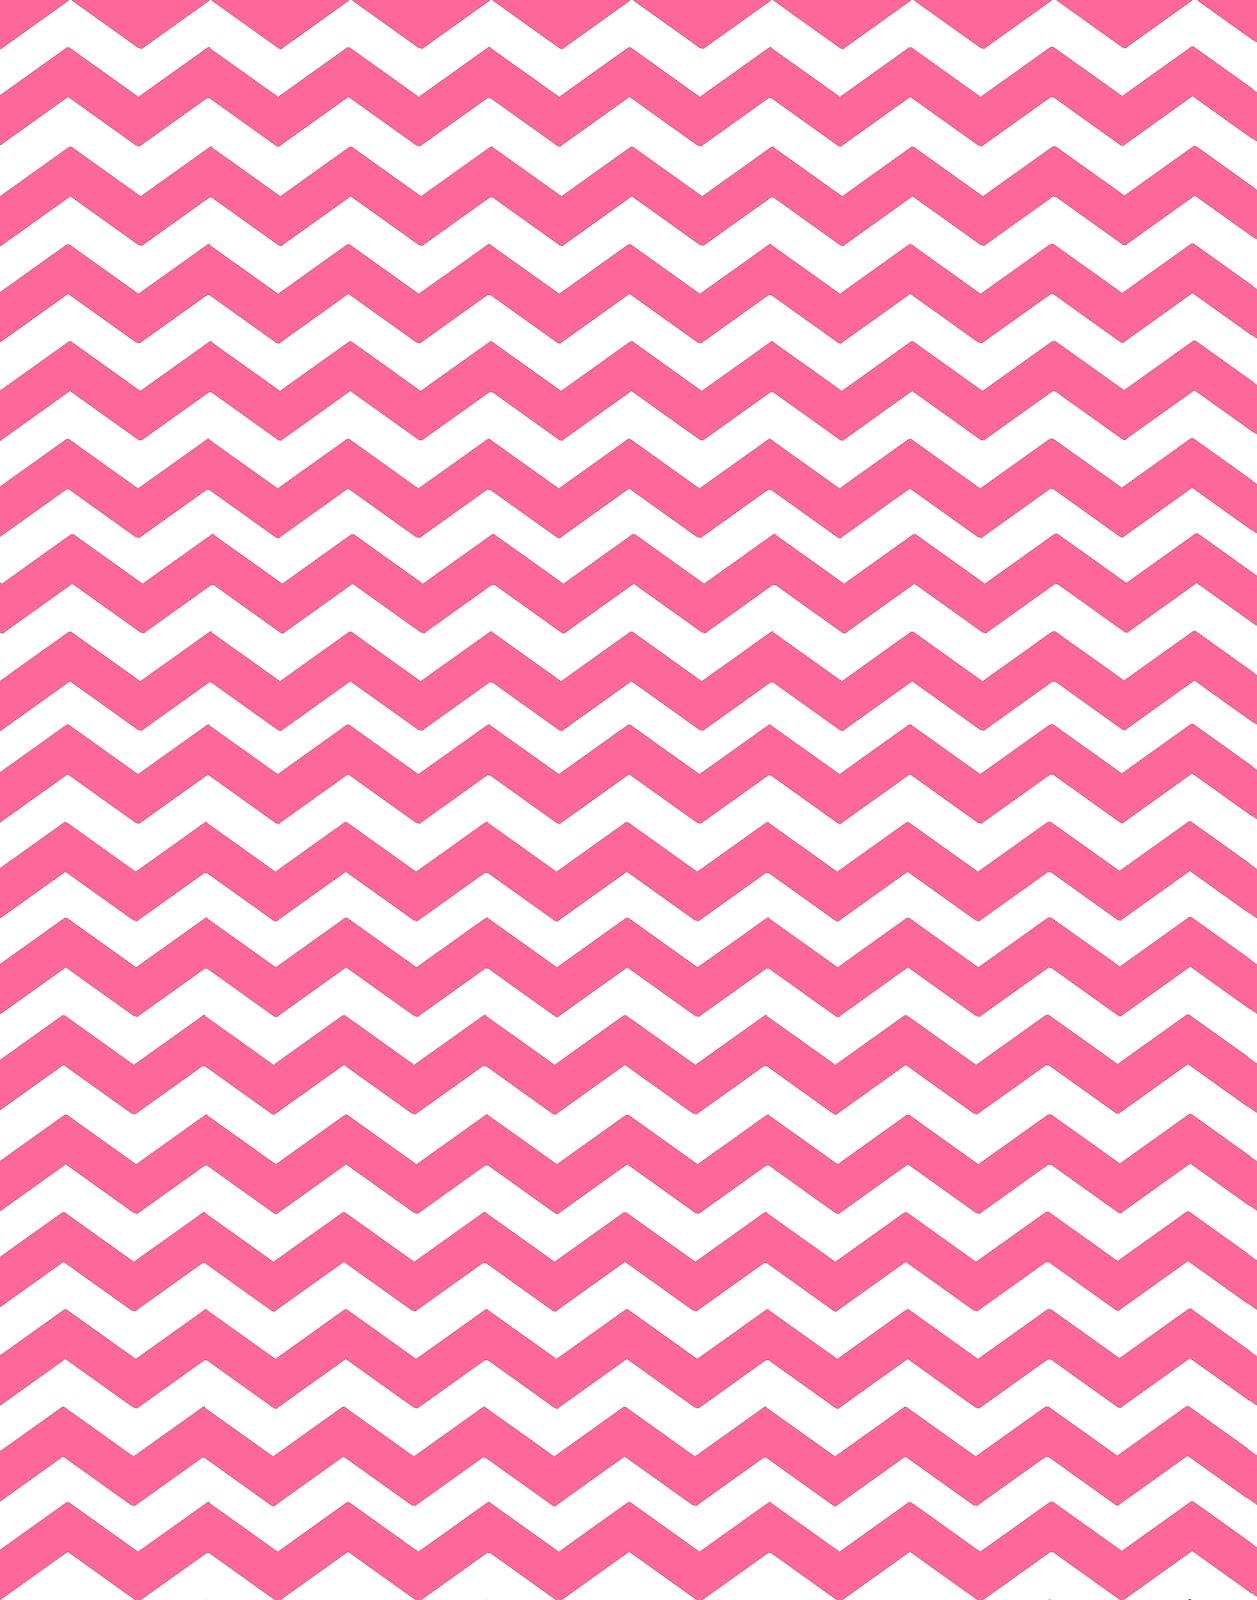 48 Pink And White Chevron Wallpaper On Wallpapersafari